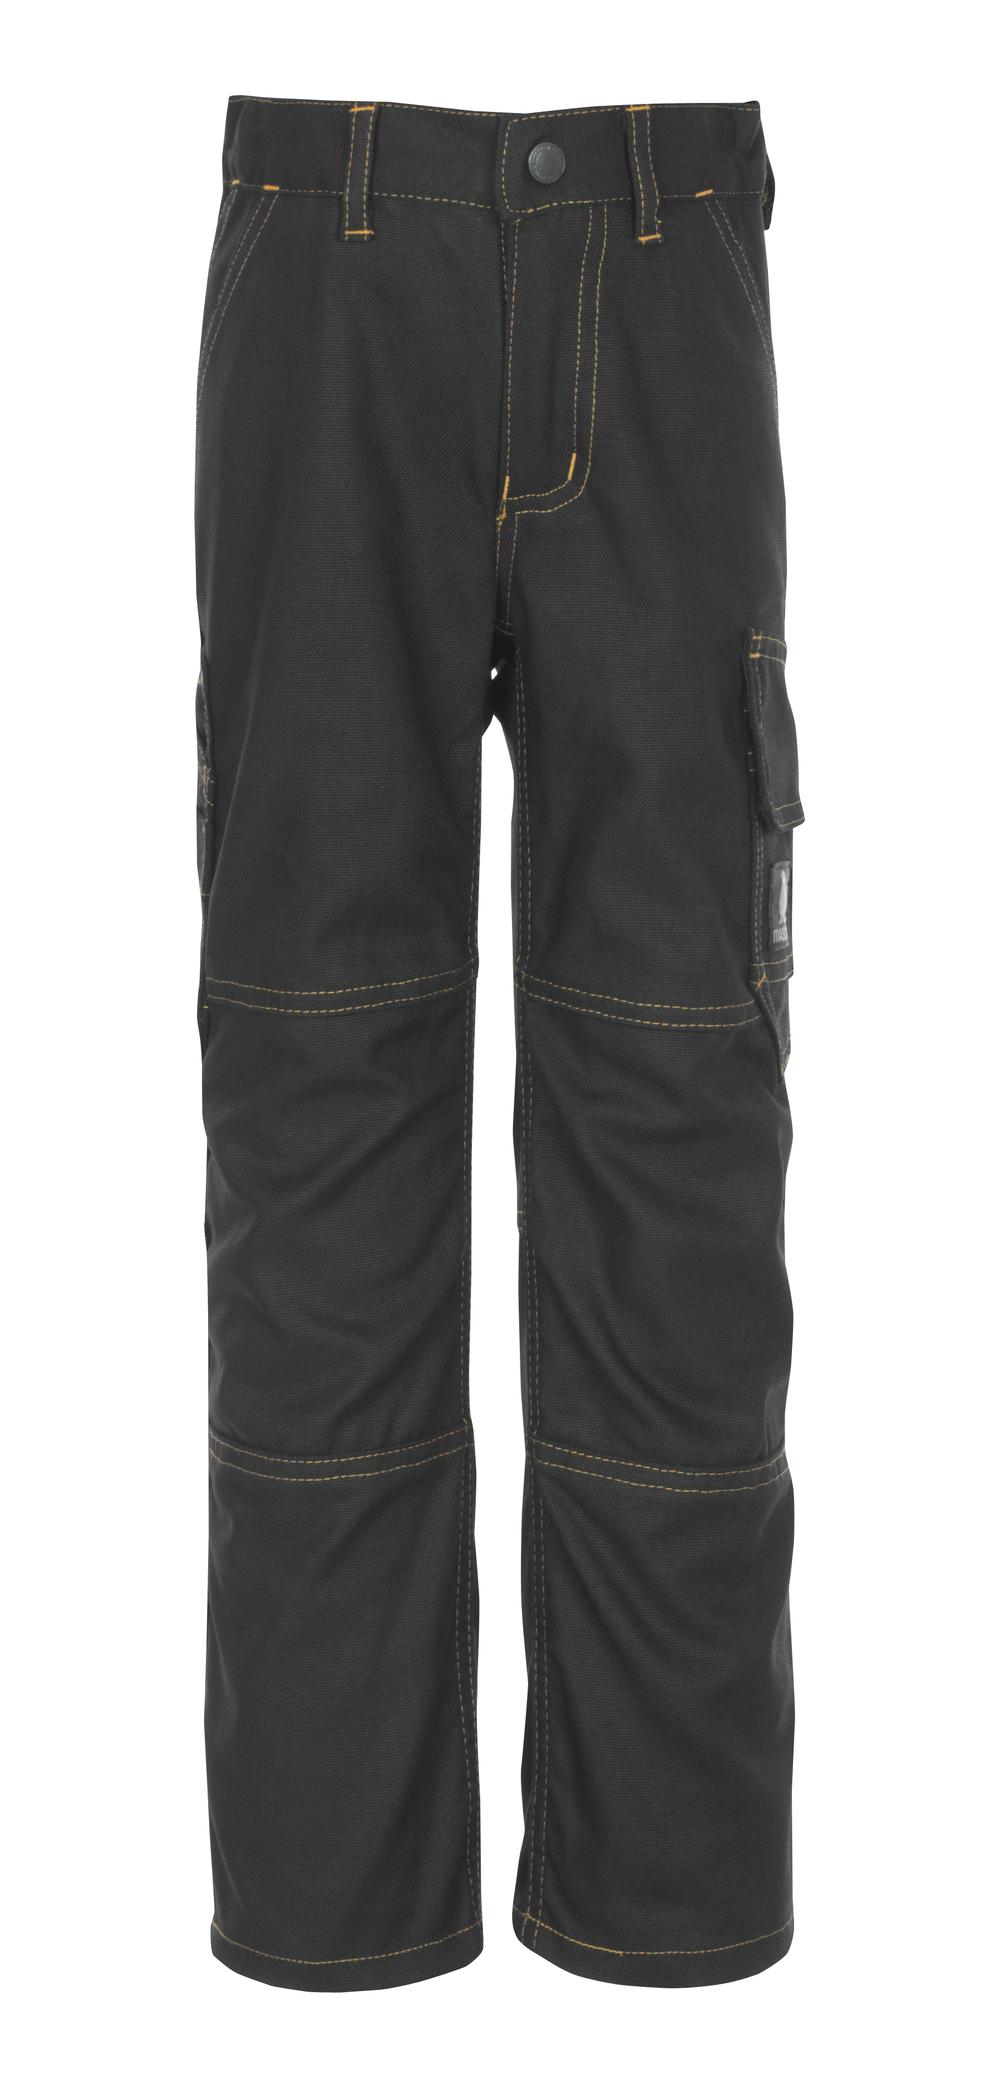 08226-010-09 Trousers for children - black